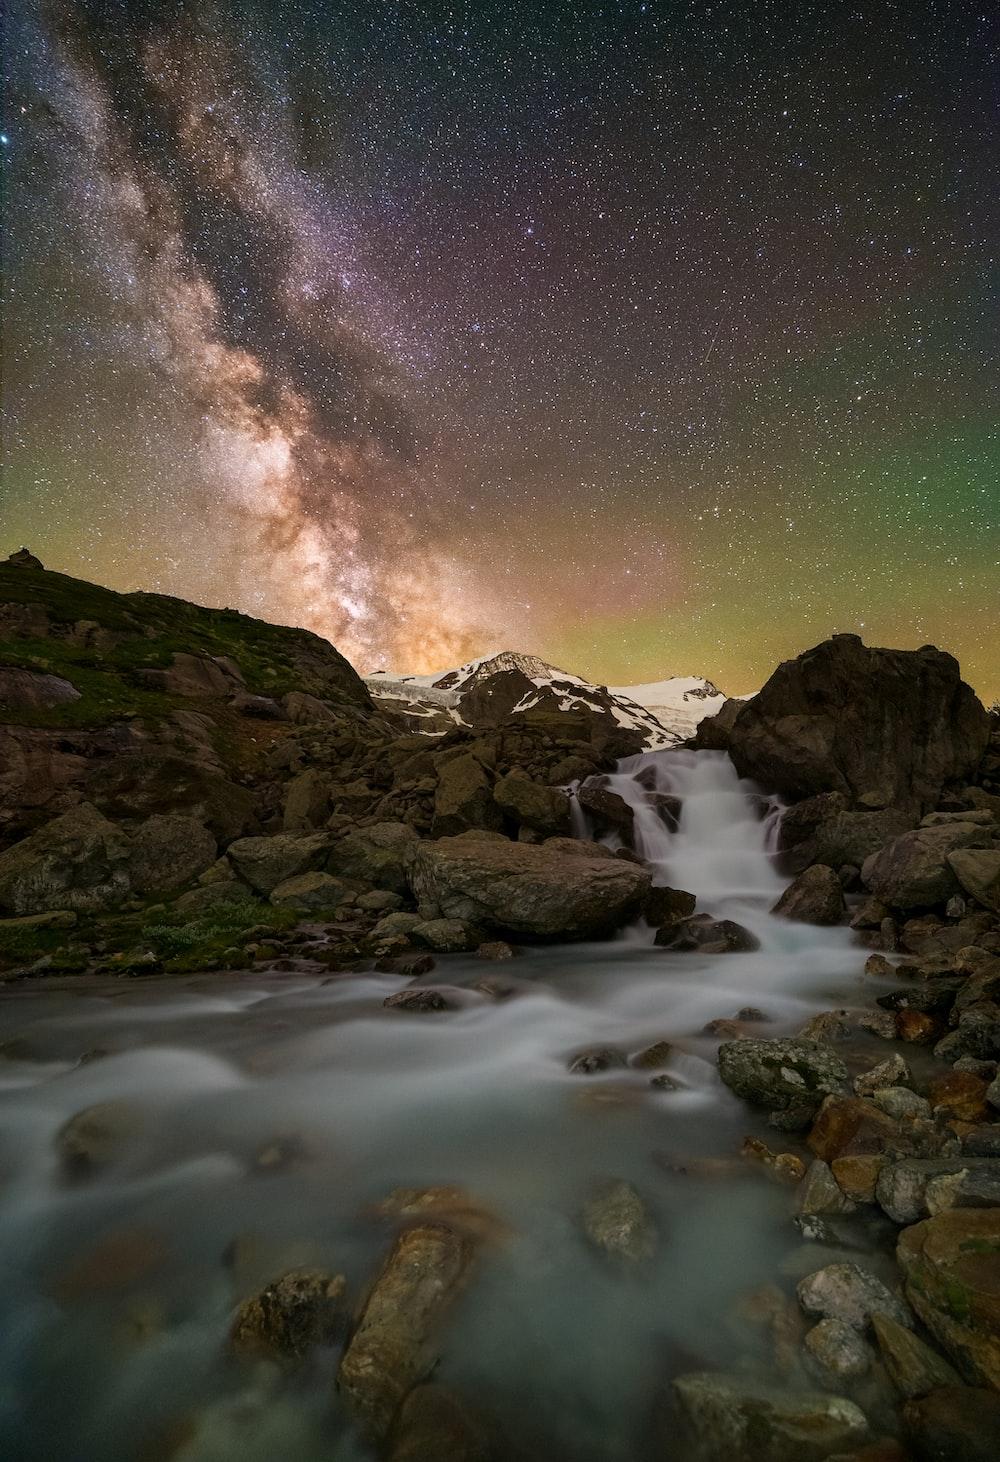 rocky mountain near body of water under starry night